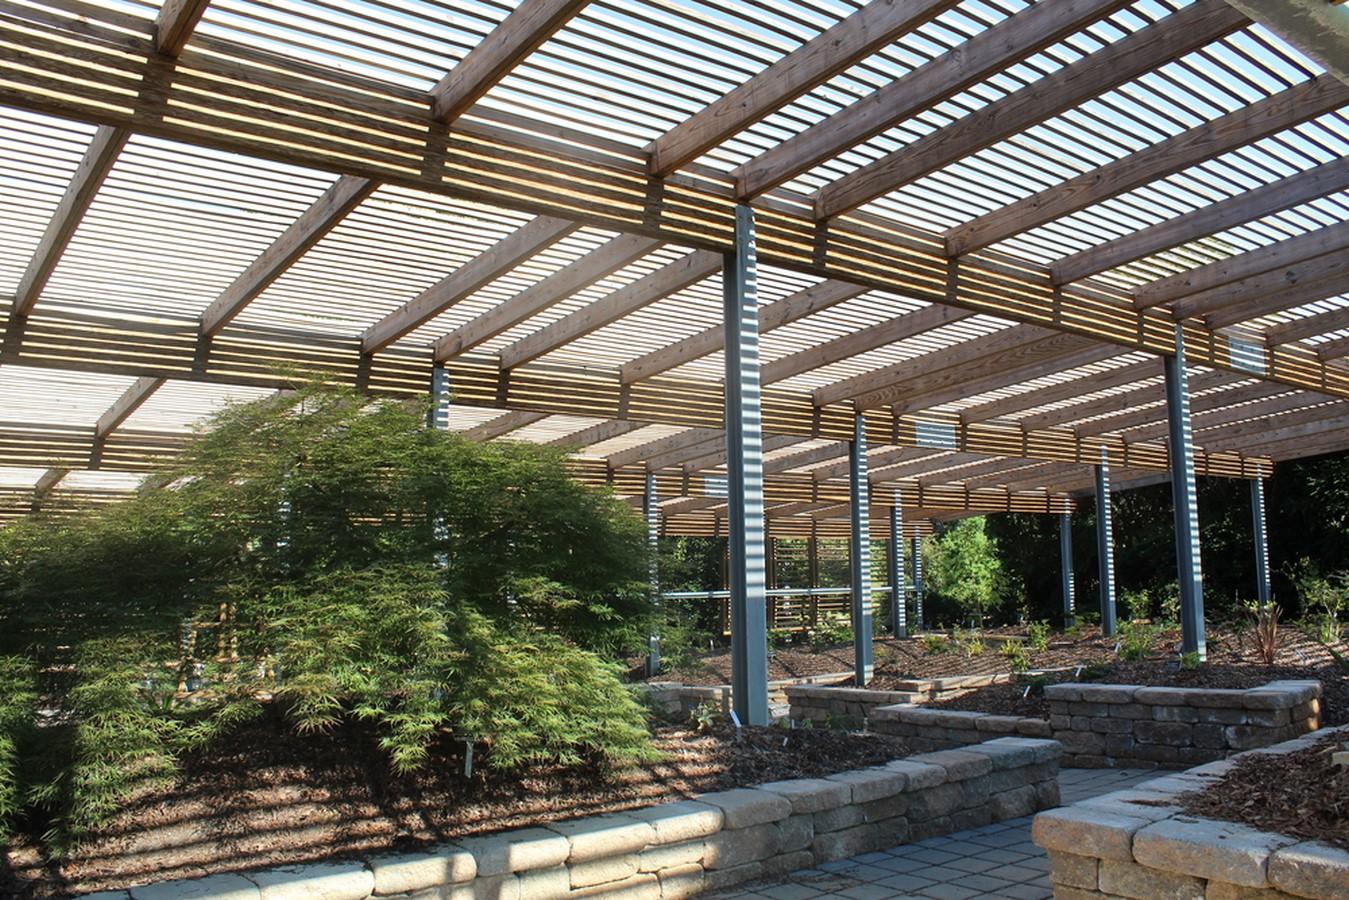 JC Raulston Arboretum Lath House Raleigh, NC ⎥ 2010 - Sheet1